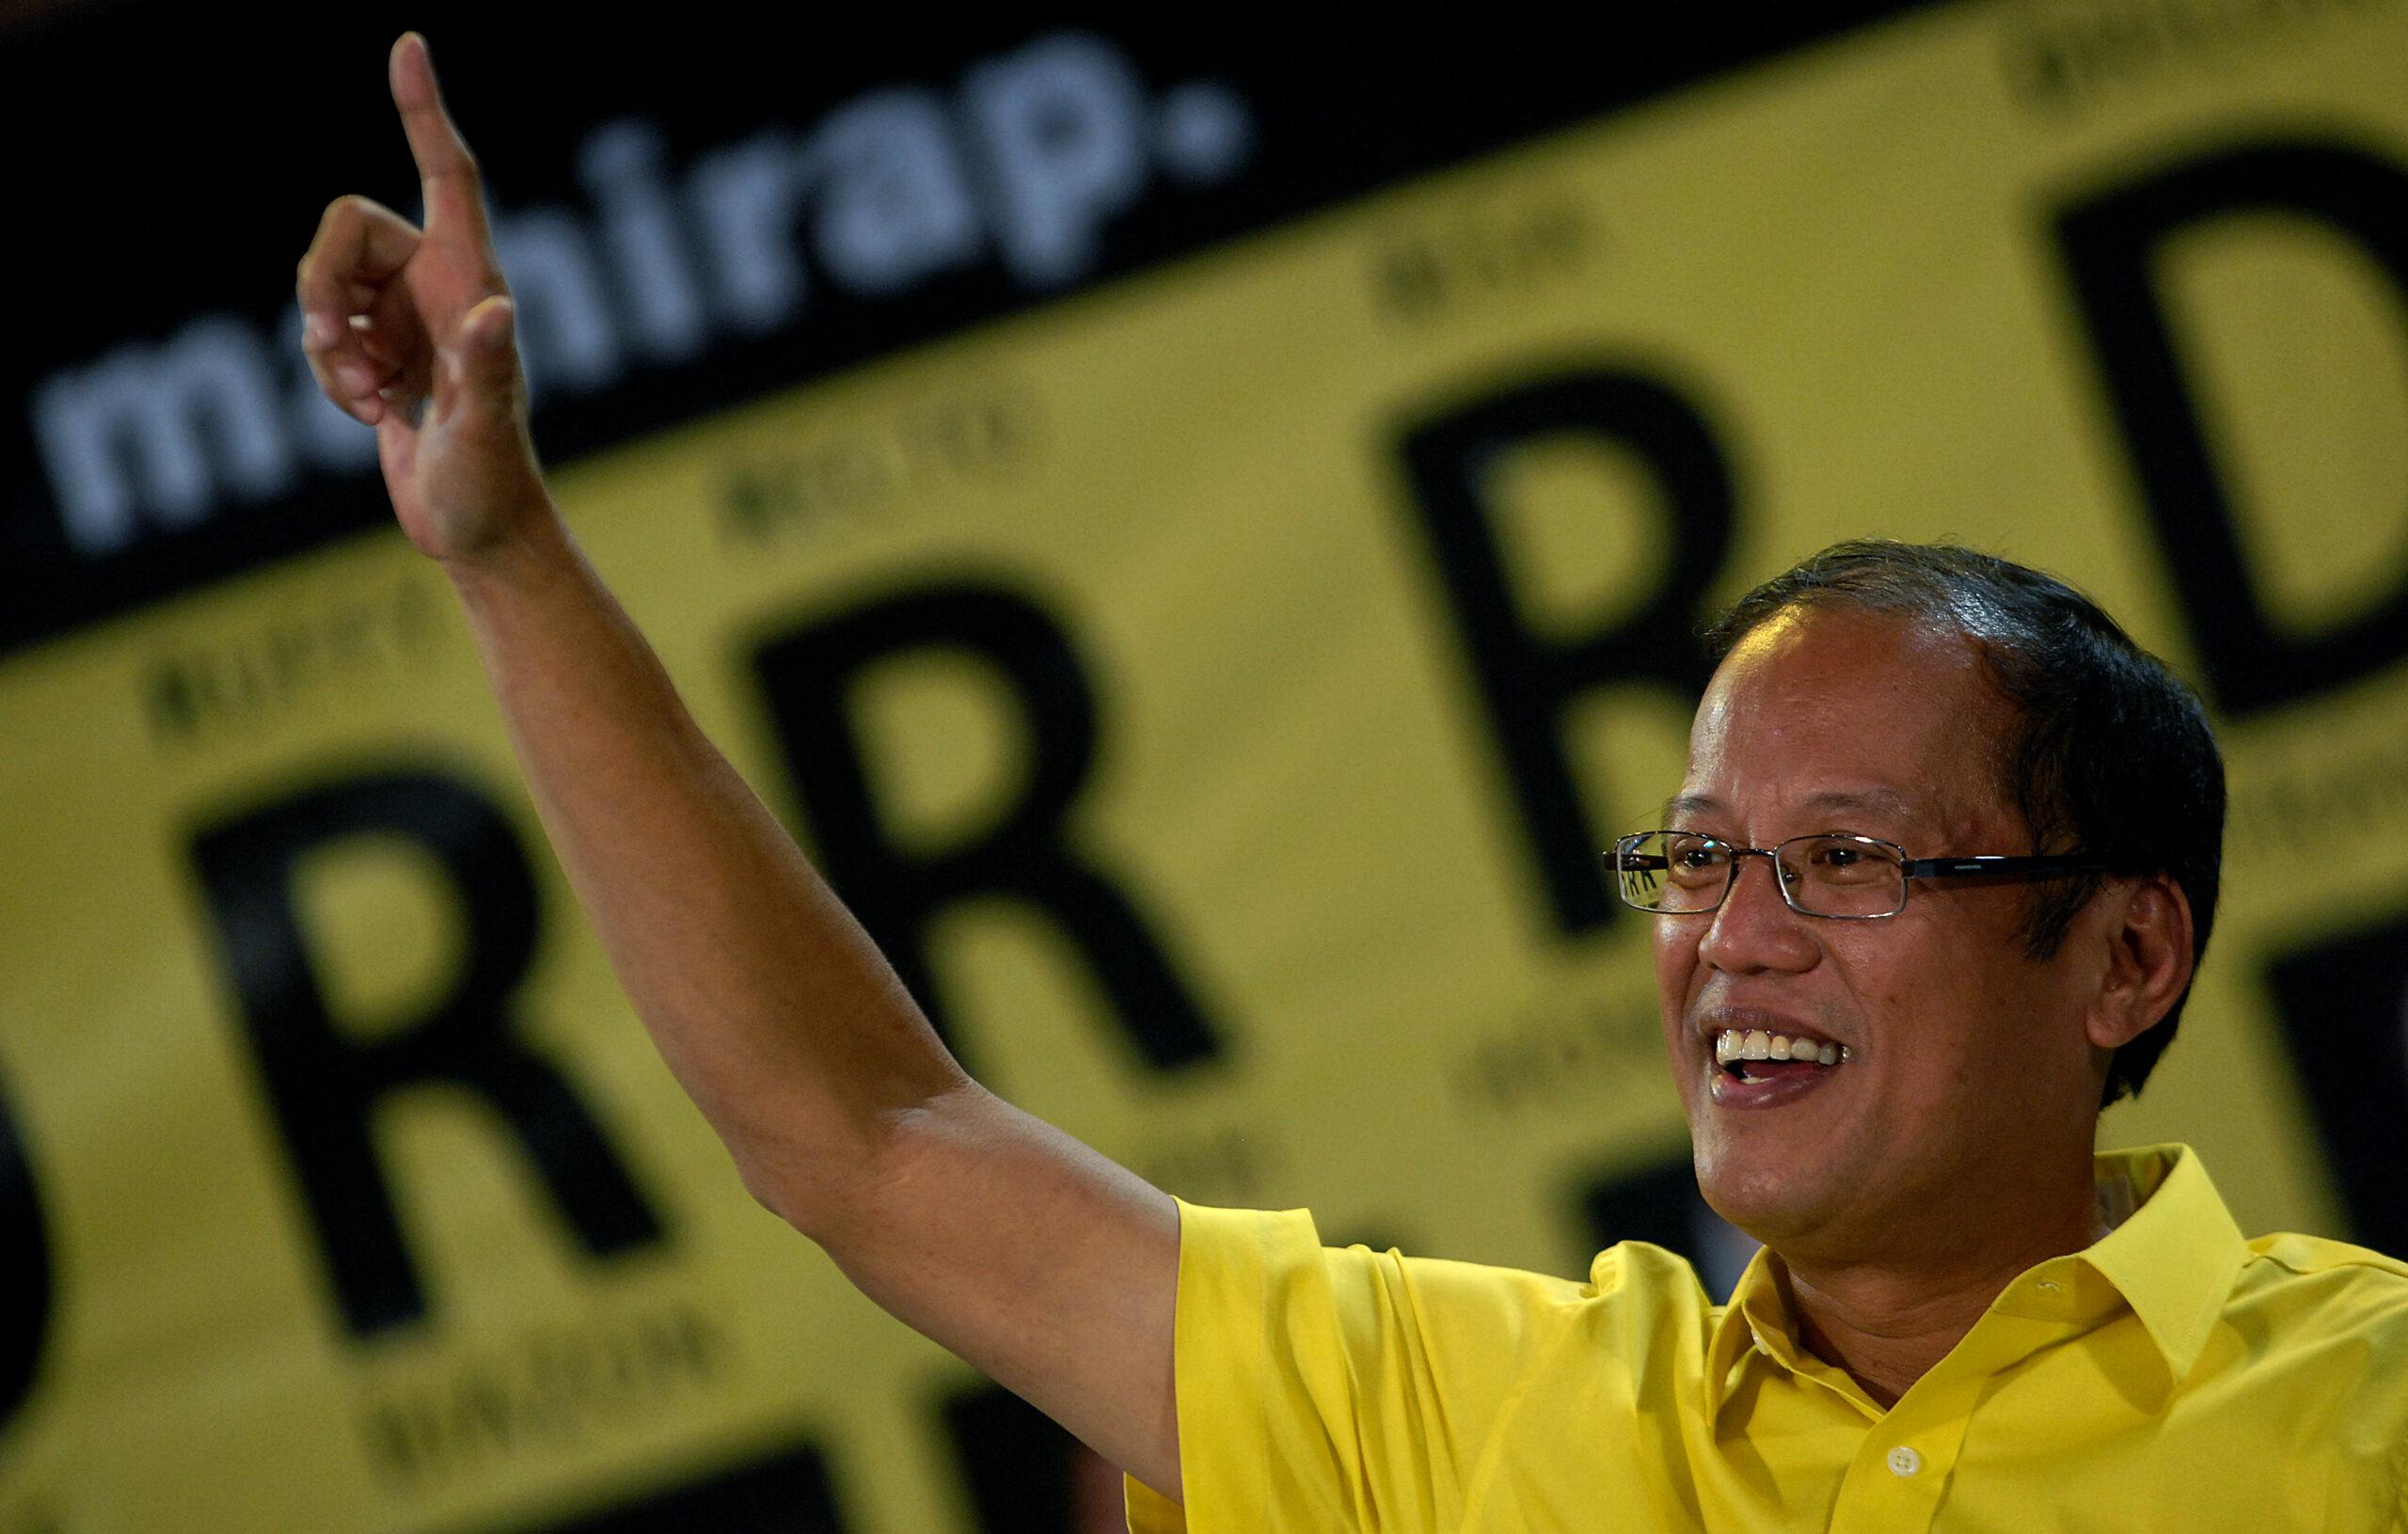 Philippines' ex-president 'Noynoy' Aquino dies at 61